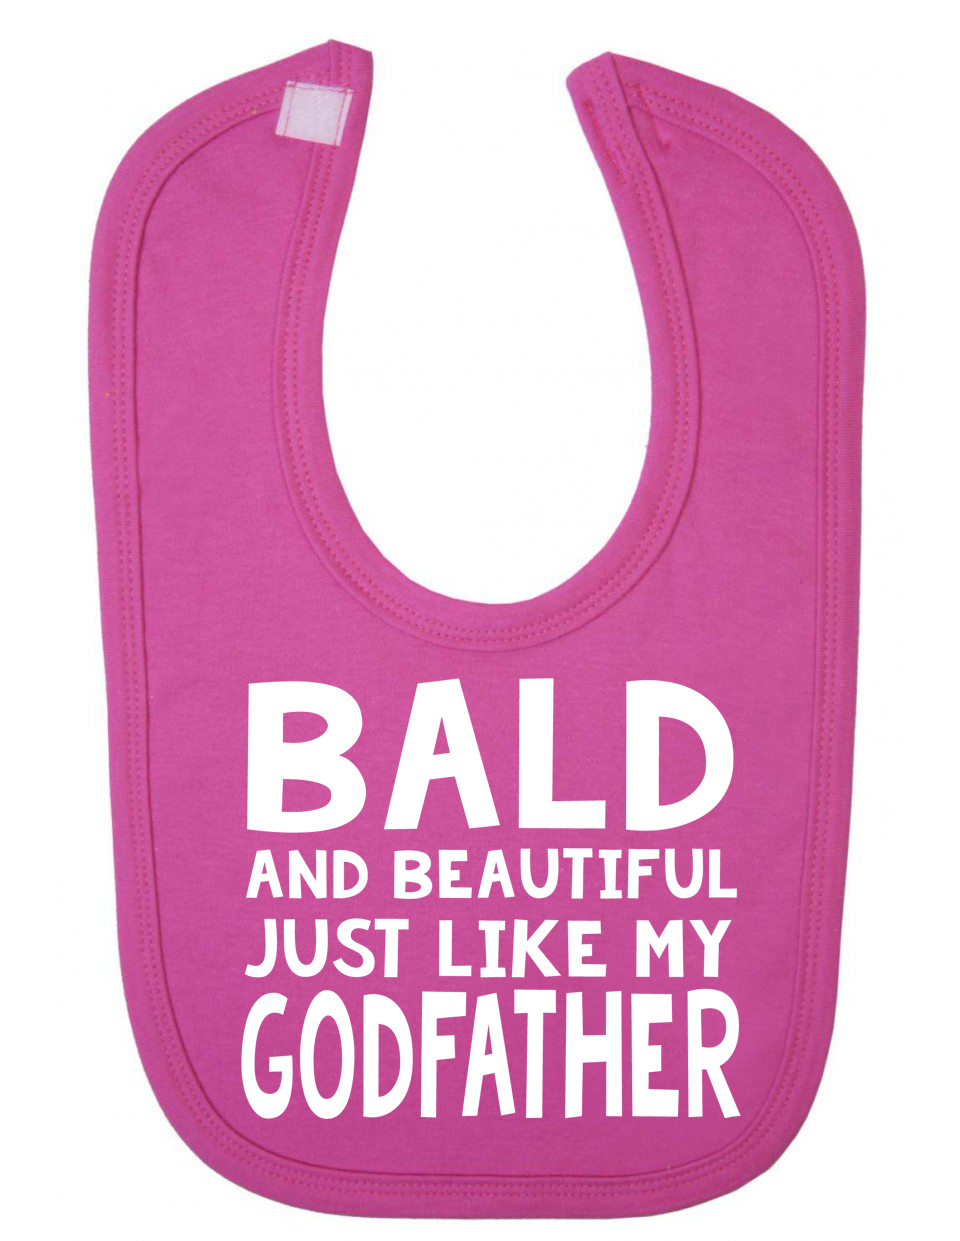 Bald and Beautiful Just Like My Godfather Newborn Toddler Baby Bib